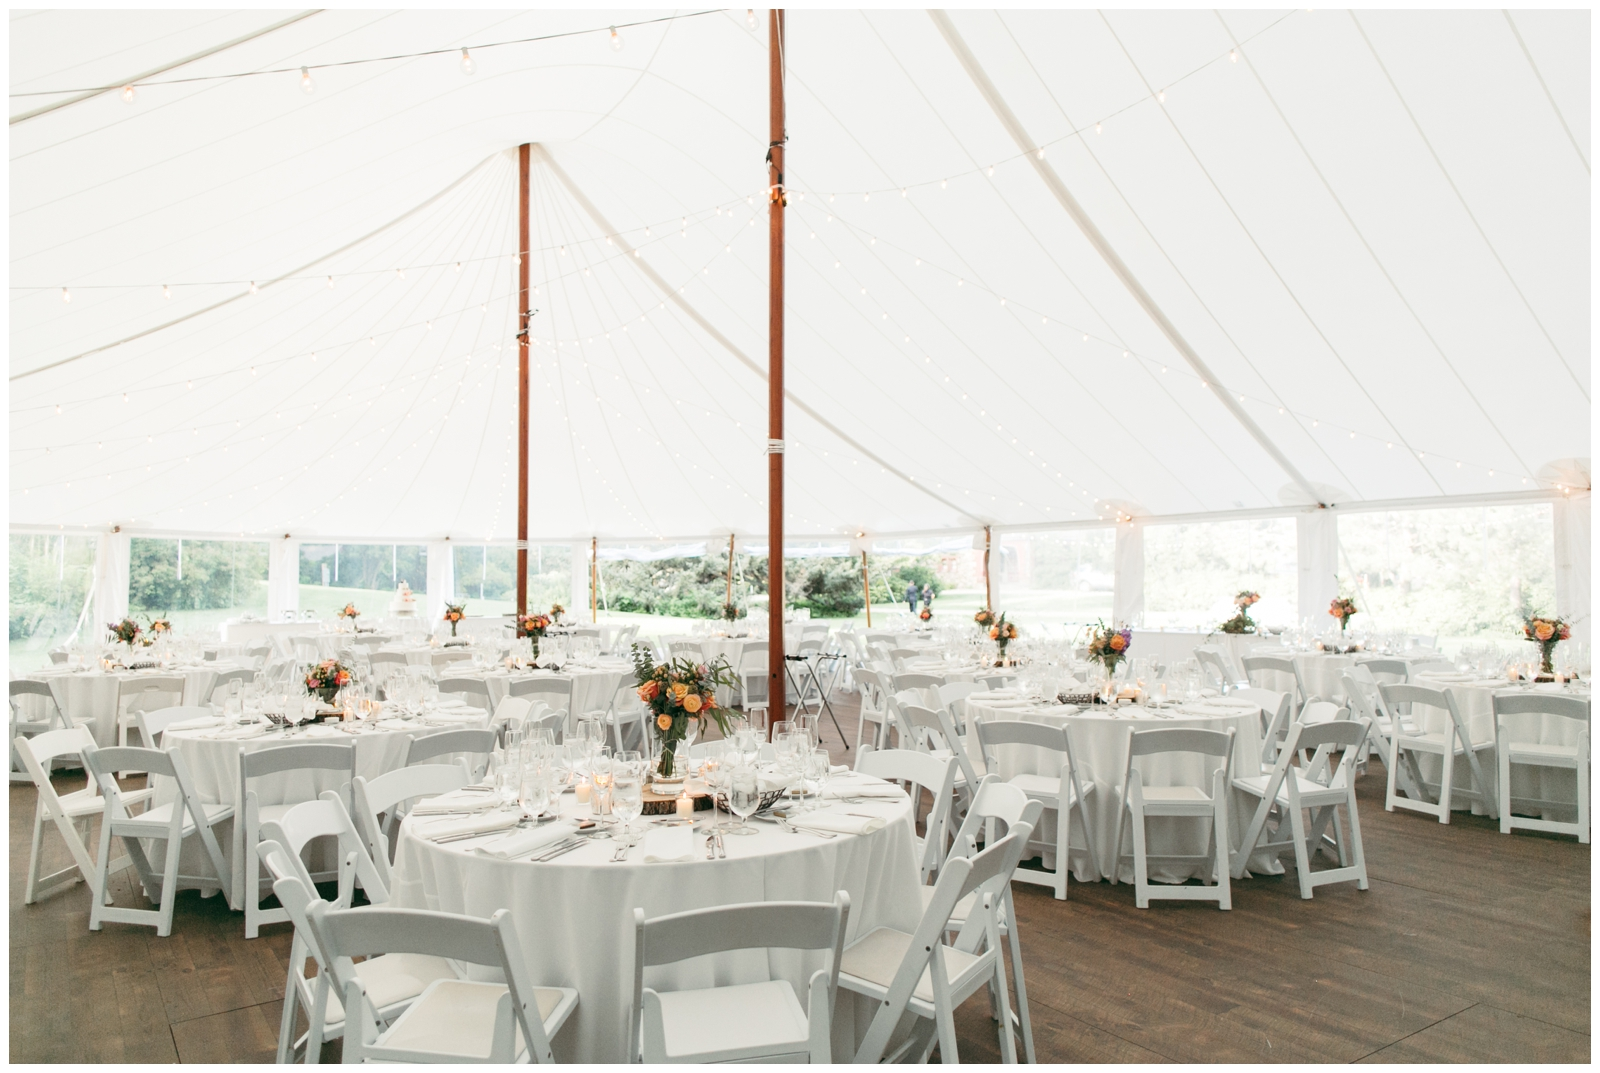 Moraine-Farm-wedding-Bailey-Q-Photo-Massachusetts-wedding-photpgrapher-099.jpg